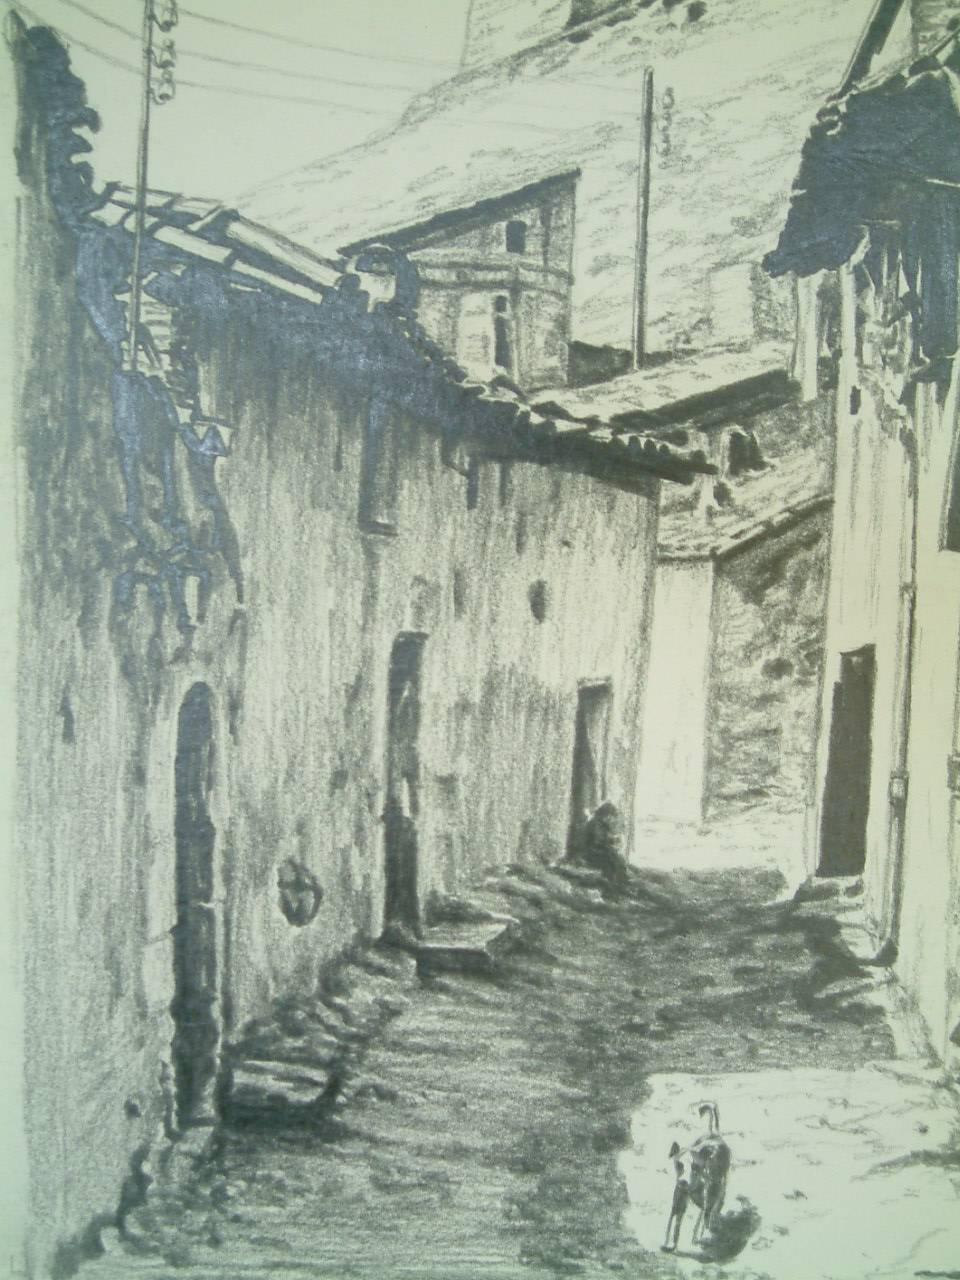 Antig o canyeret lleida fernando barranco morell - Pintores en lleida ...